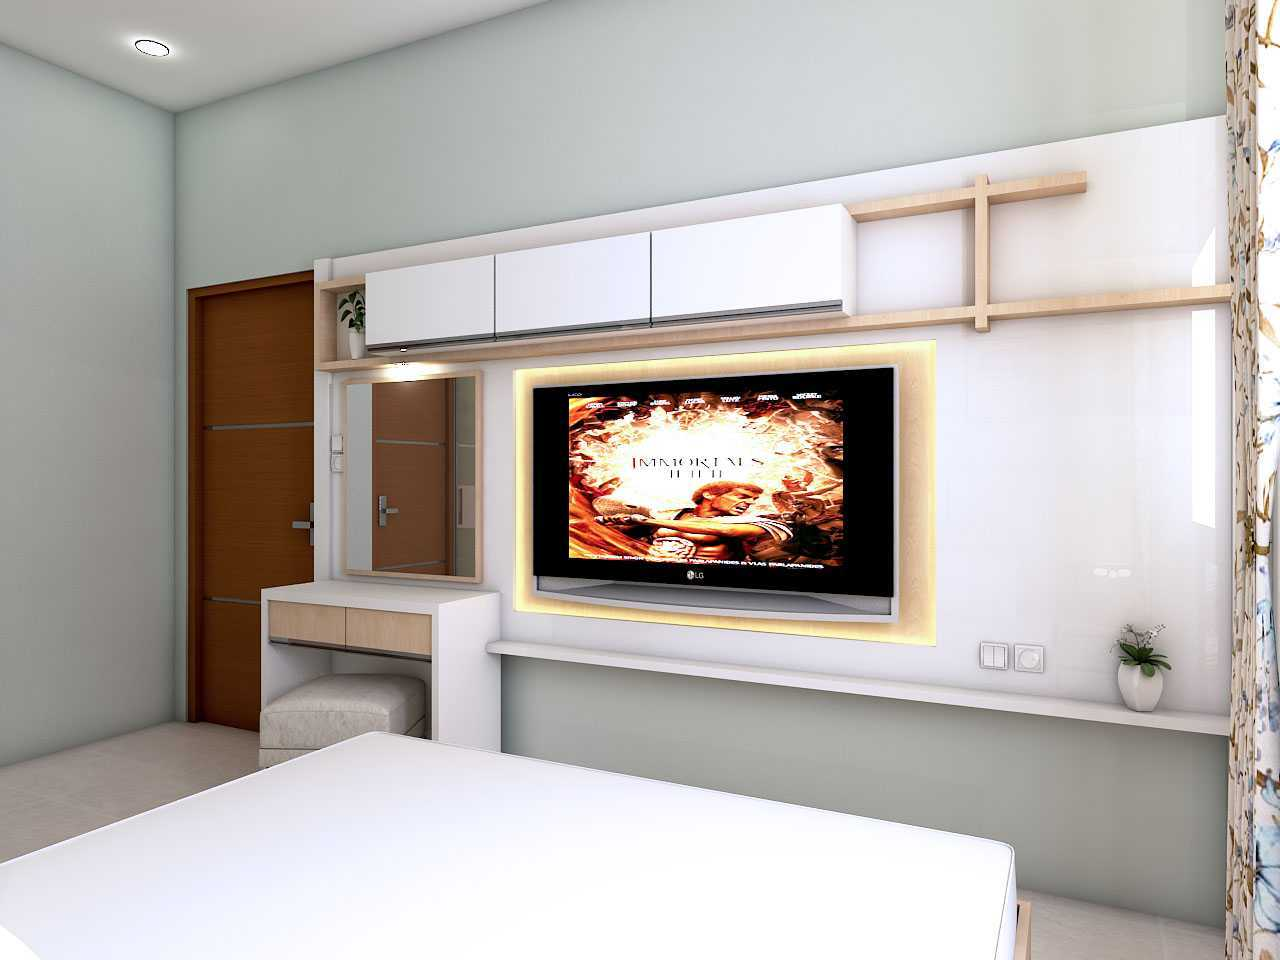 Arteta Interior Design & Furniture Master Bed Room Modern Minimalis Surakarta, Kota Surakarta, Jawa Tengah, Indonesia Surakarta, Kota Surakarta, Jawa Tengah, Indonesia Bedroom   41192